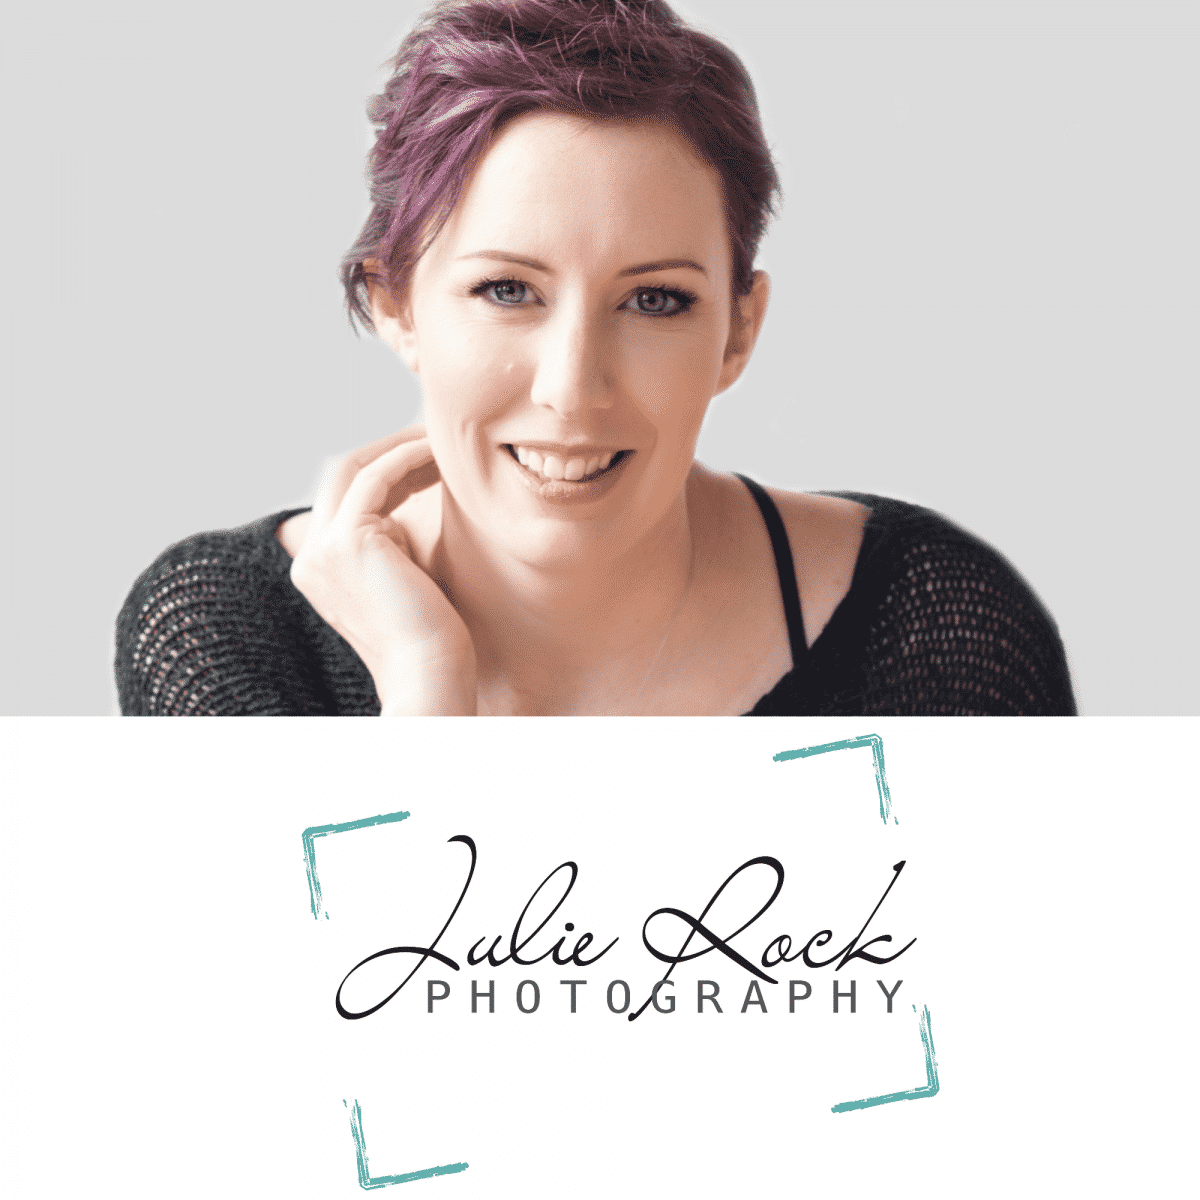 Julie Rock Photography